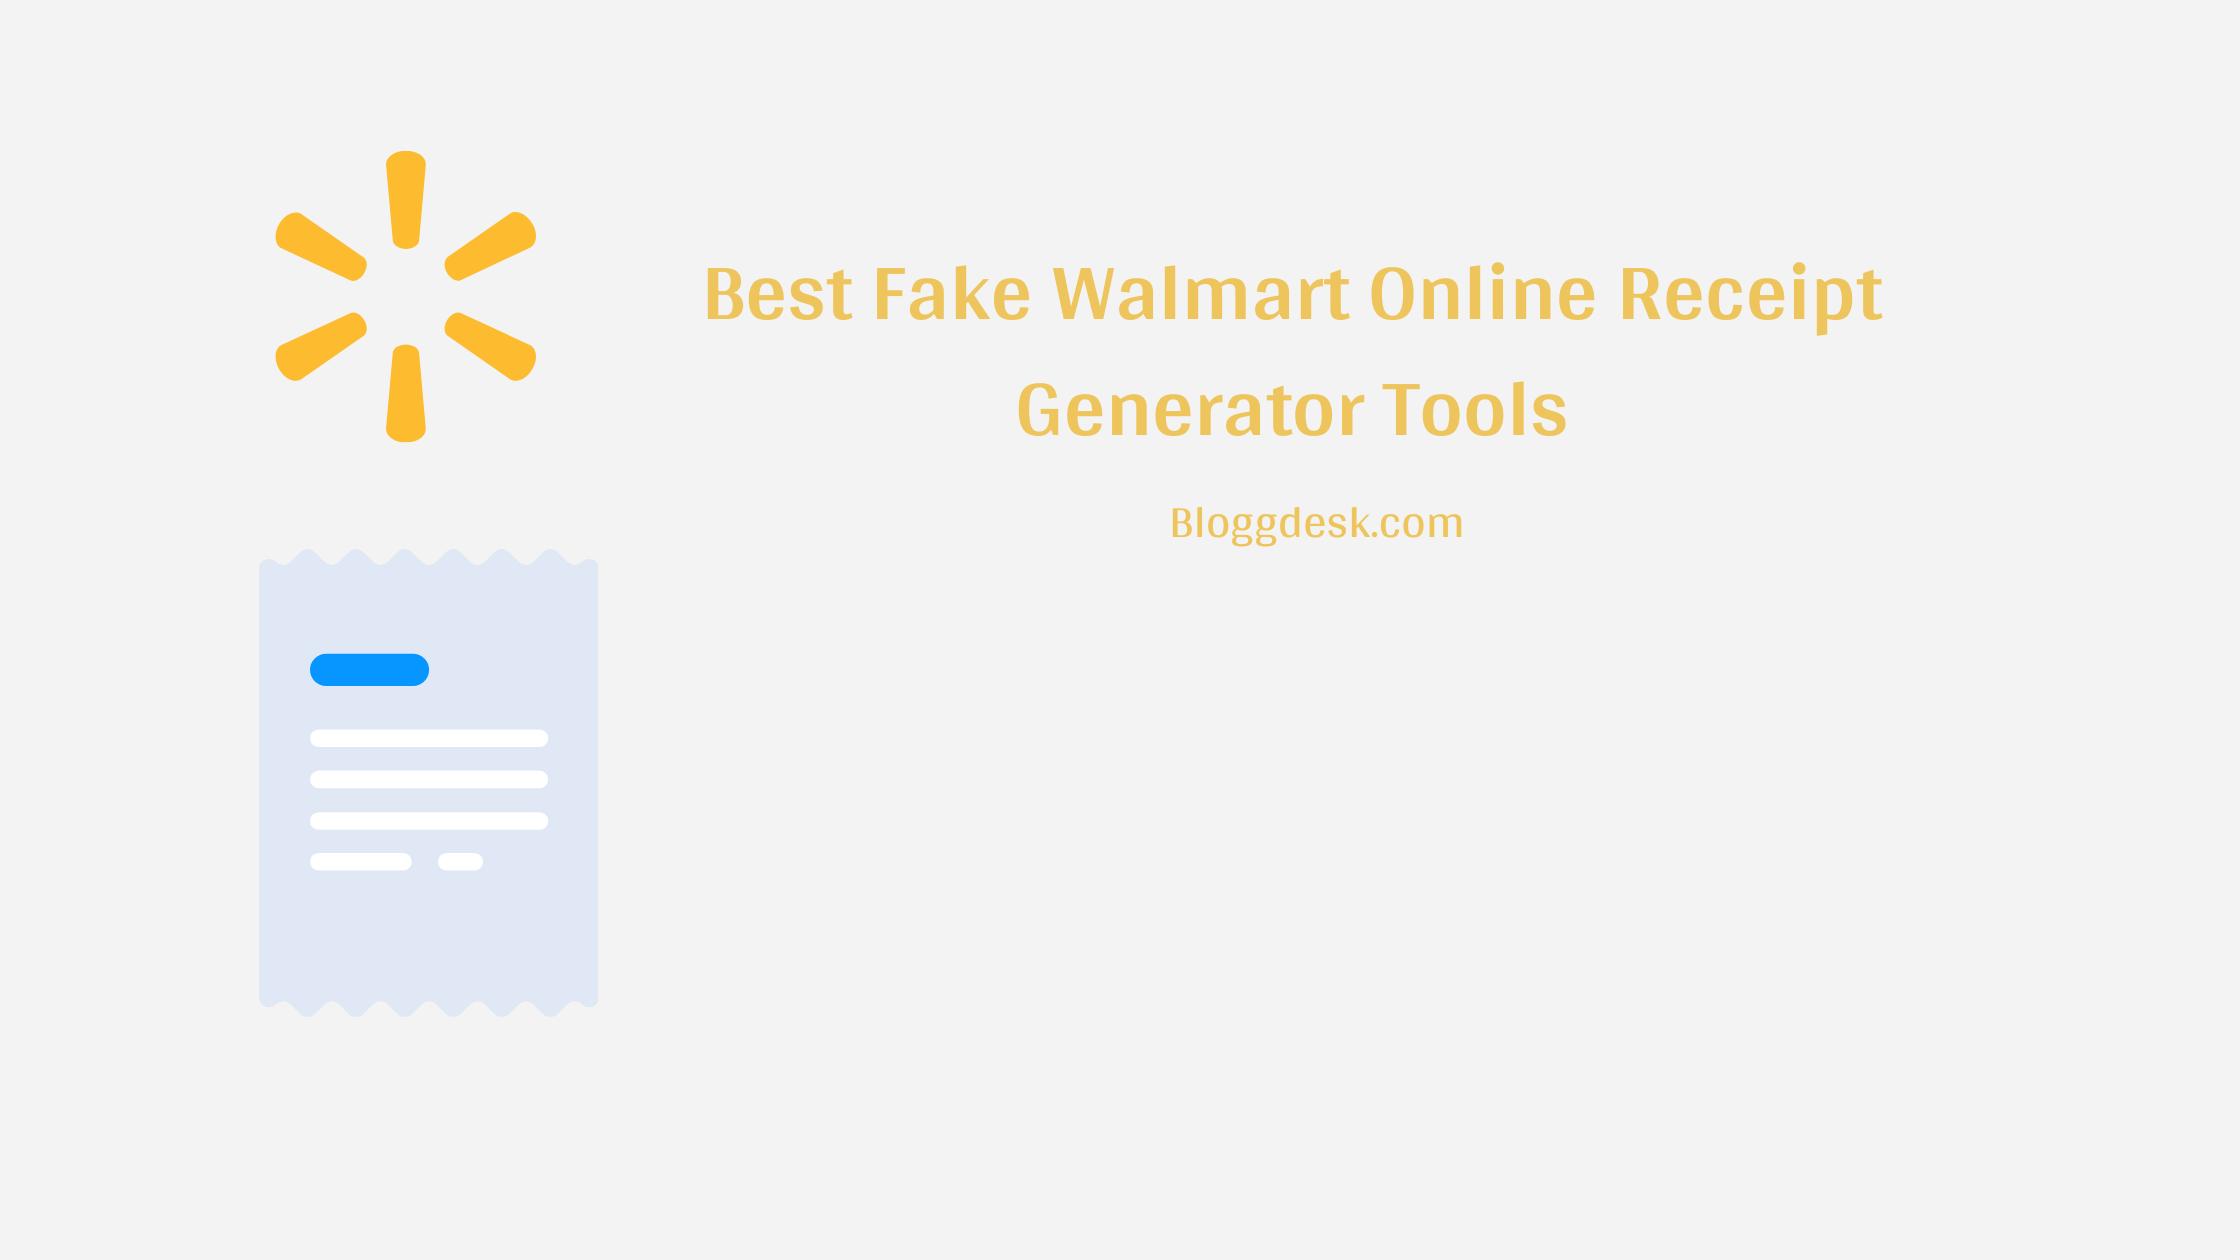 10 Best Fake Walmart Online Receipt Generator Tools to Create Walmart Style